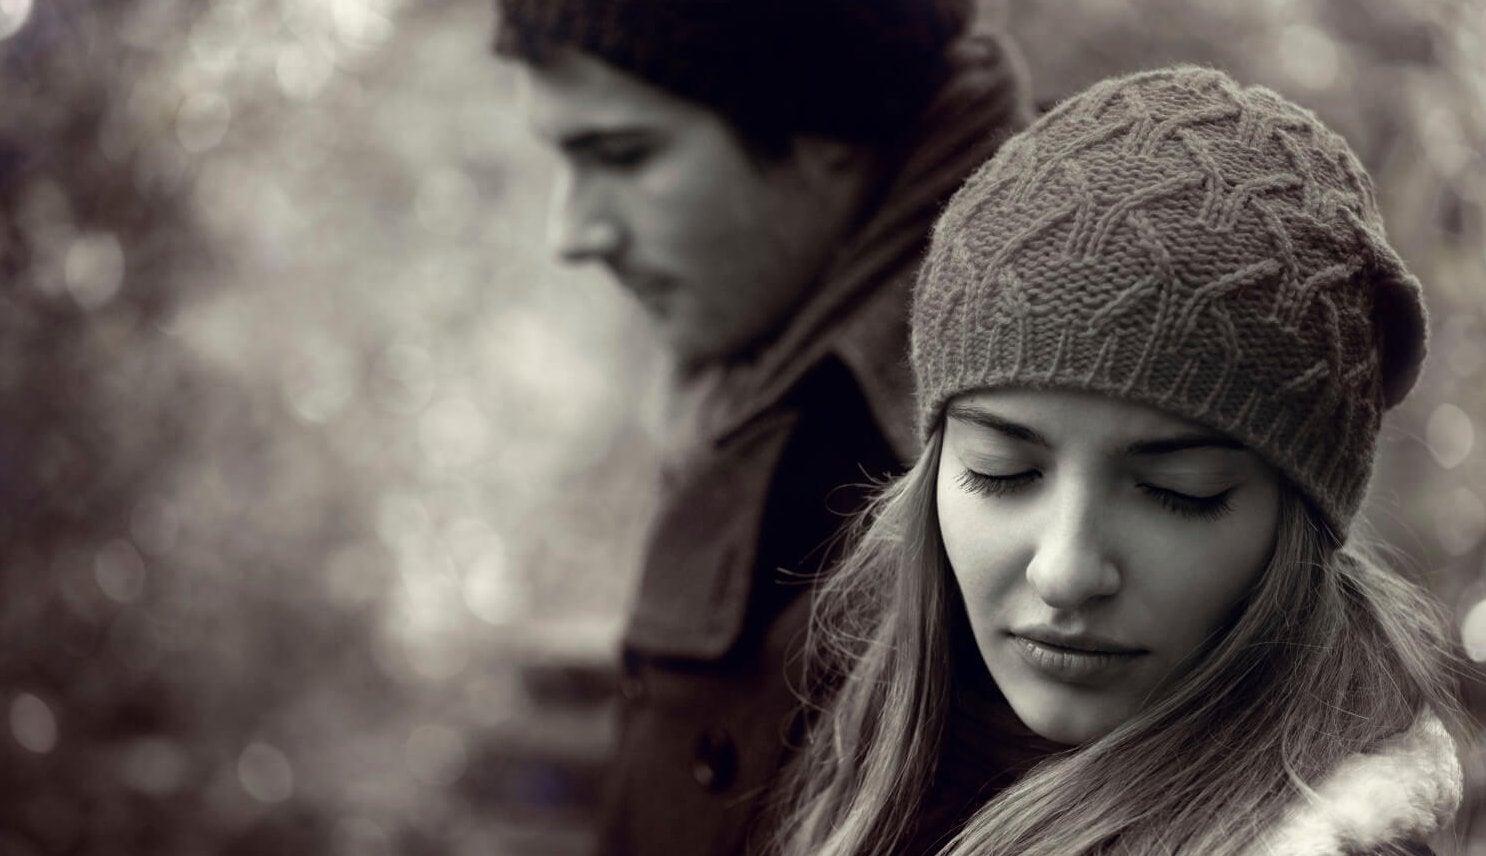 Chica triste infeliz con su compromiso de pareja